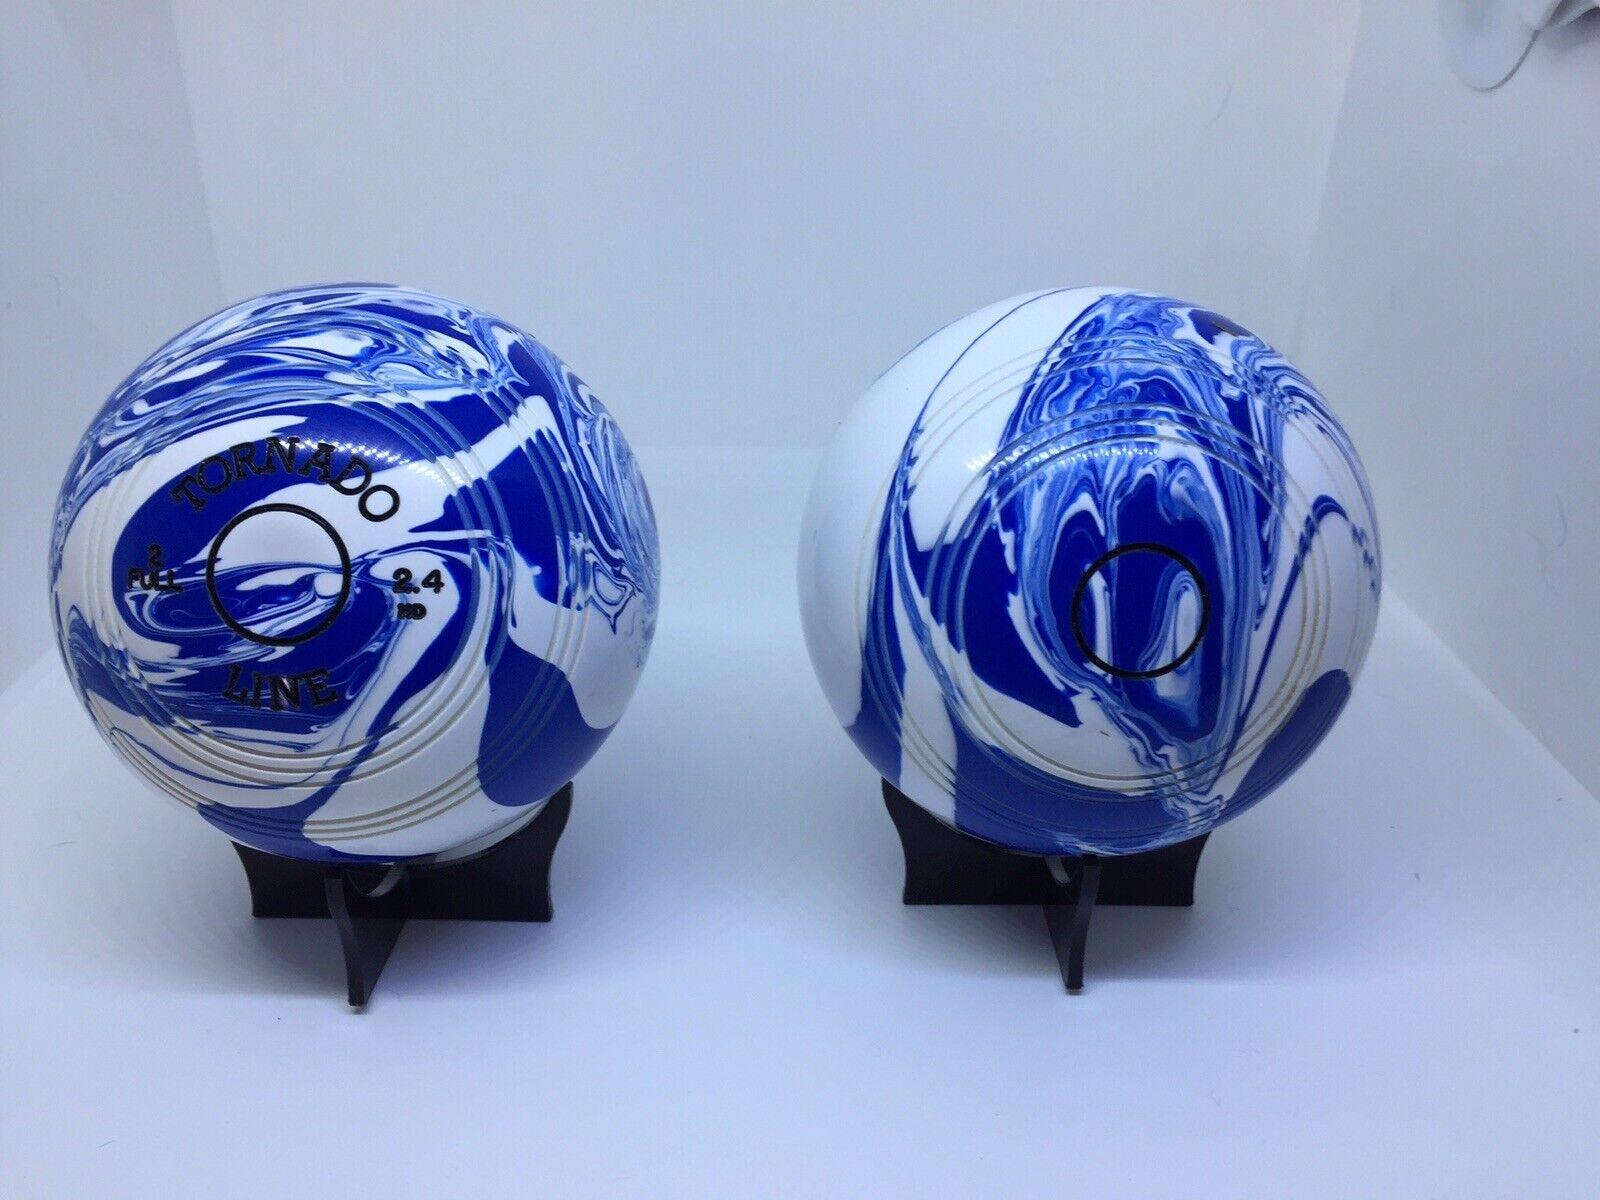 Crown Green Bowls bluee White Marble 2.8 HD